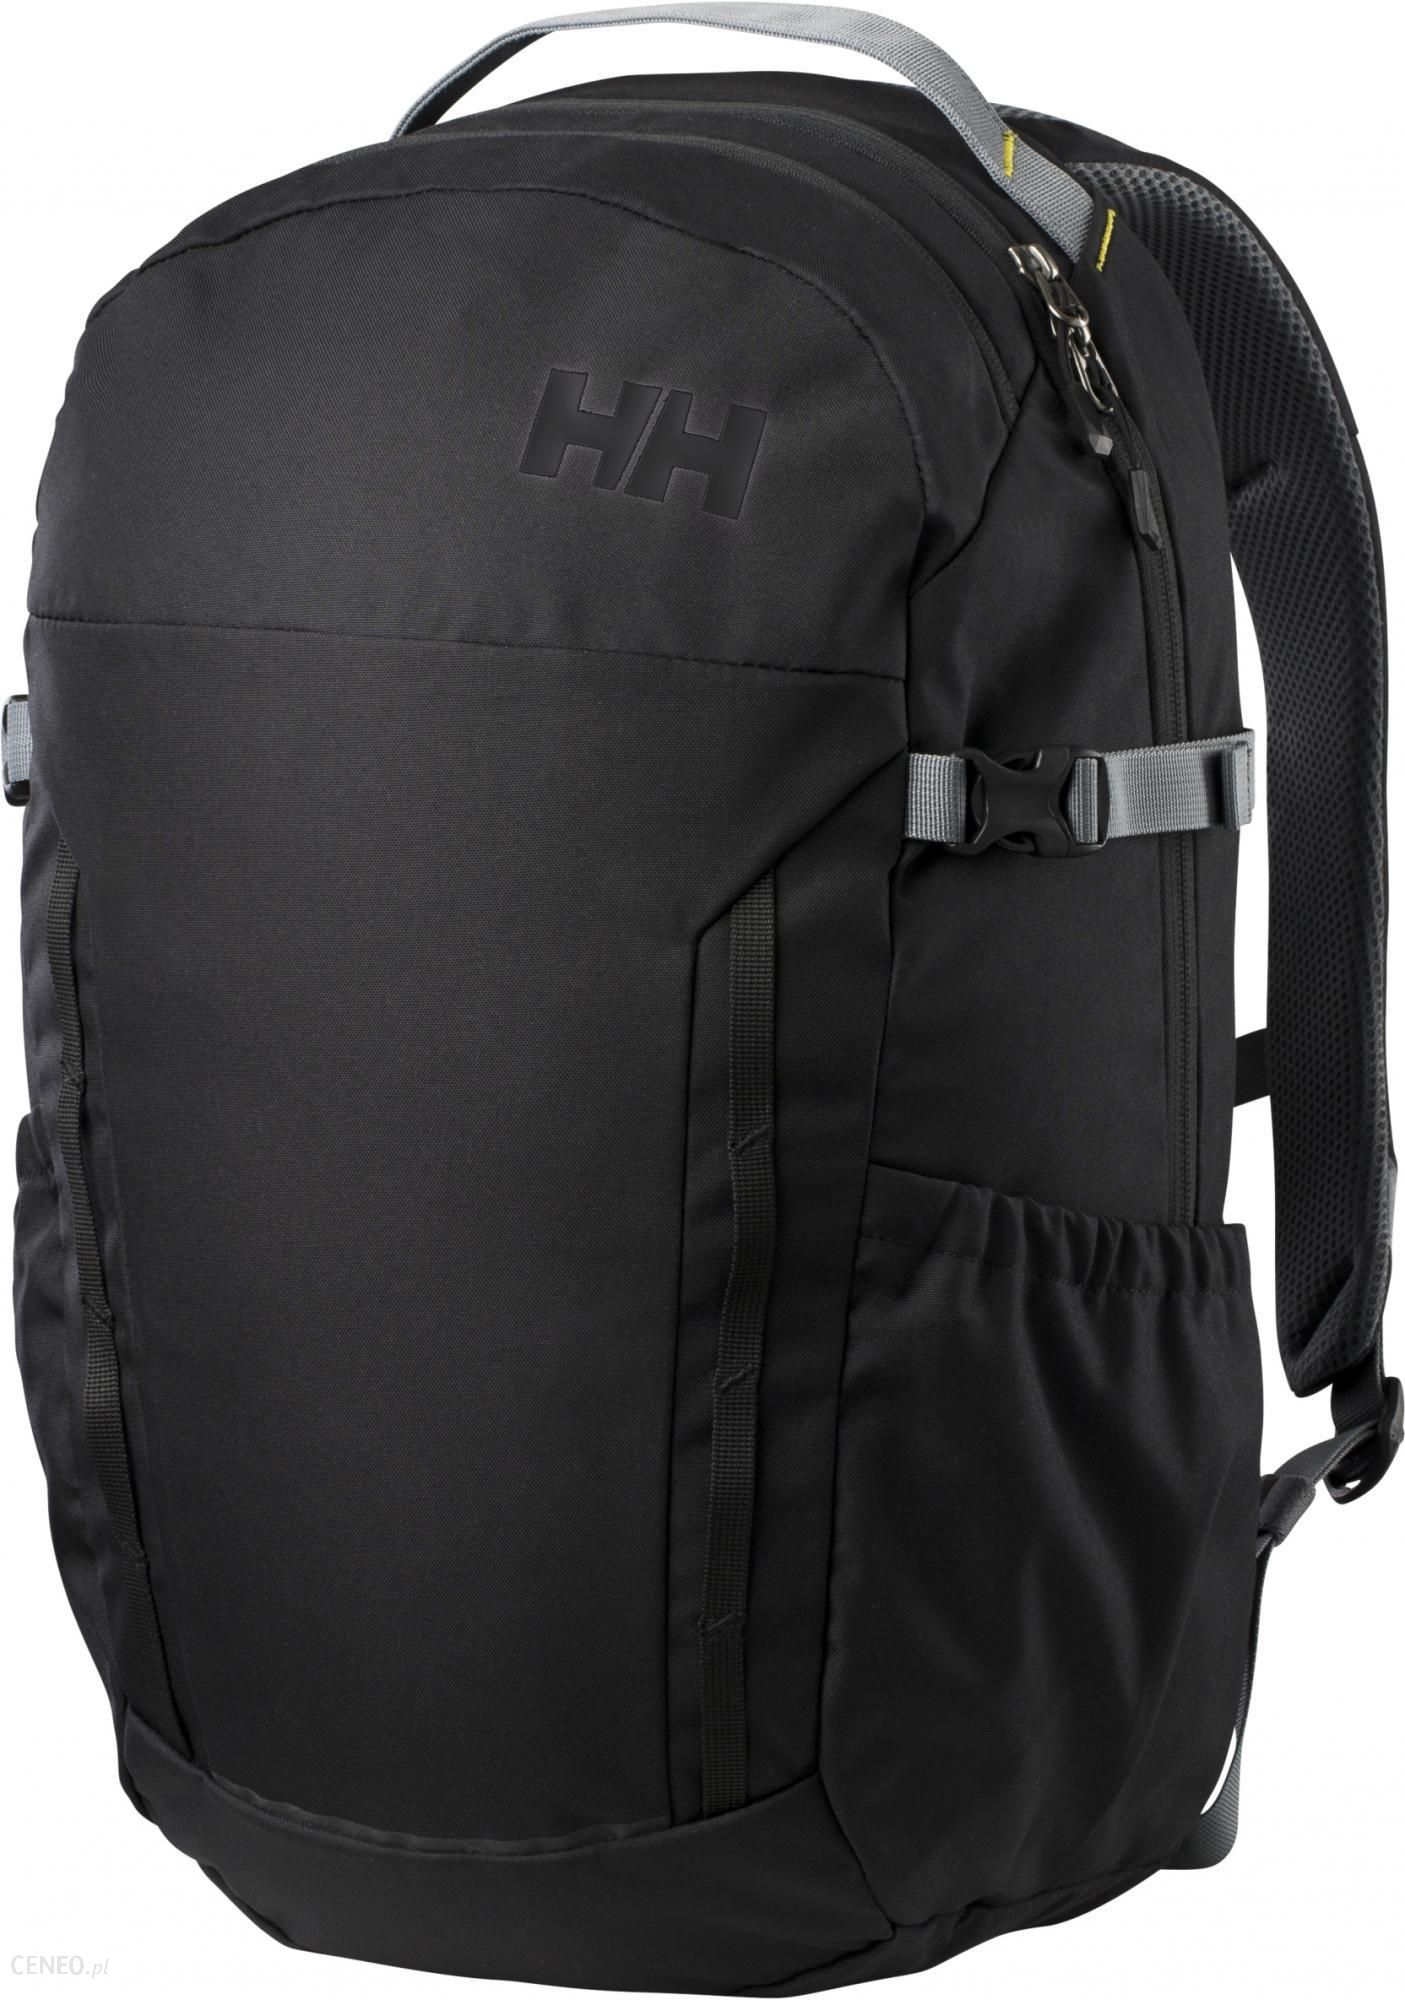 dd9eb7b86eacb Plecak Helly Hansen Loke Backpack Black Lublin - Sklepy